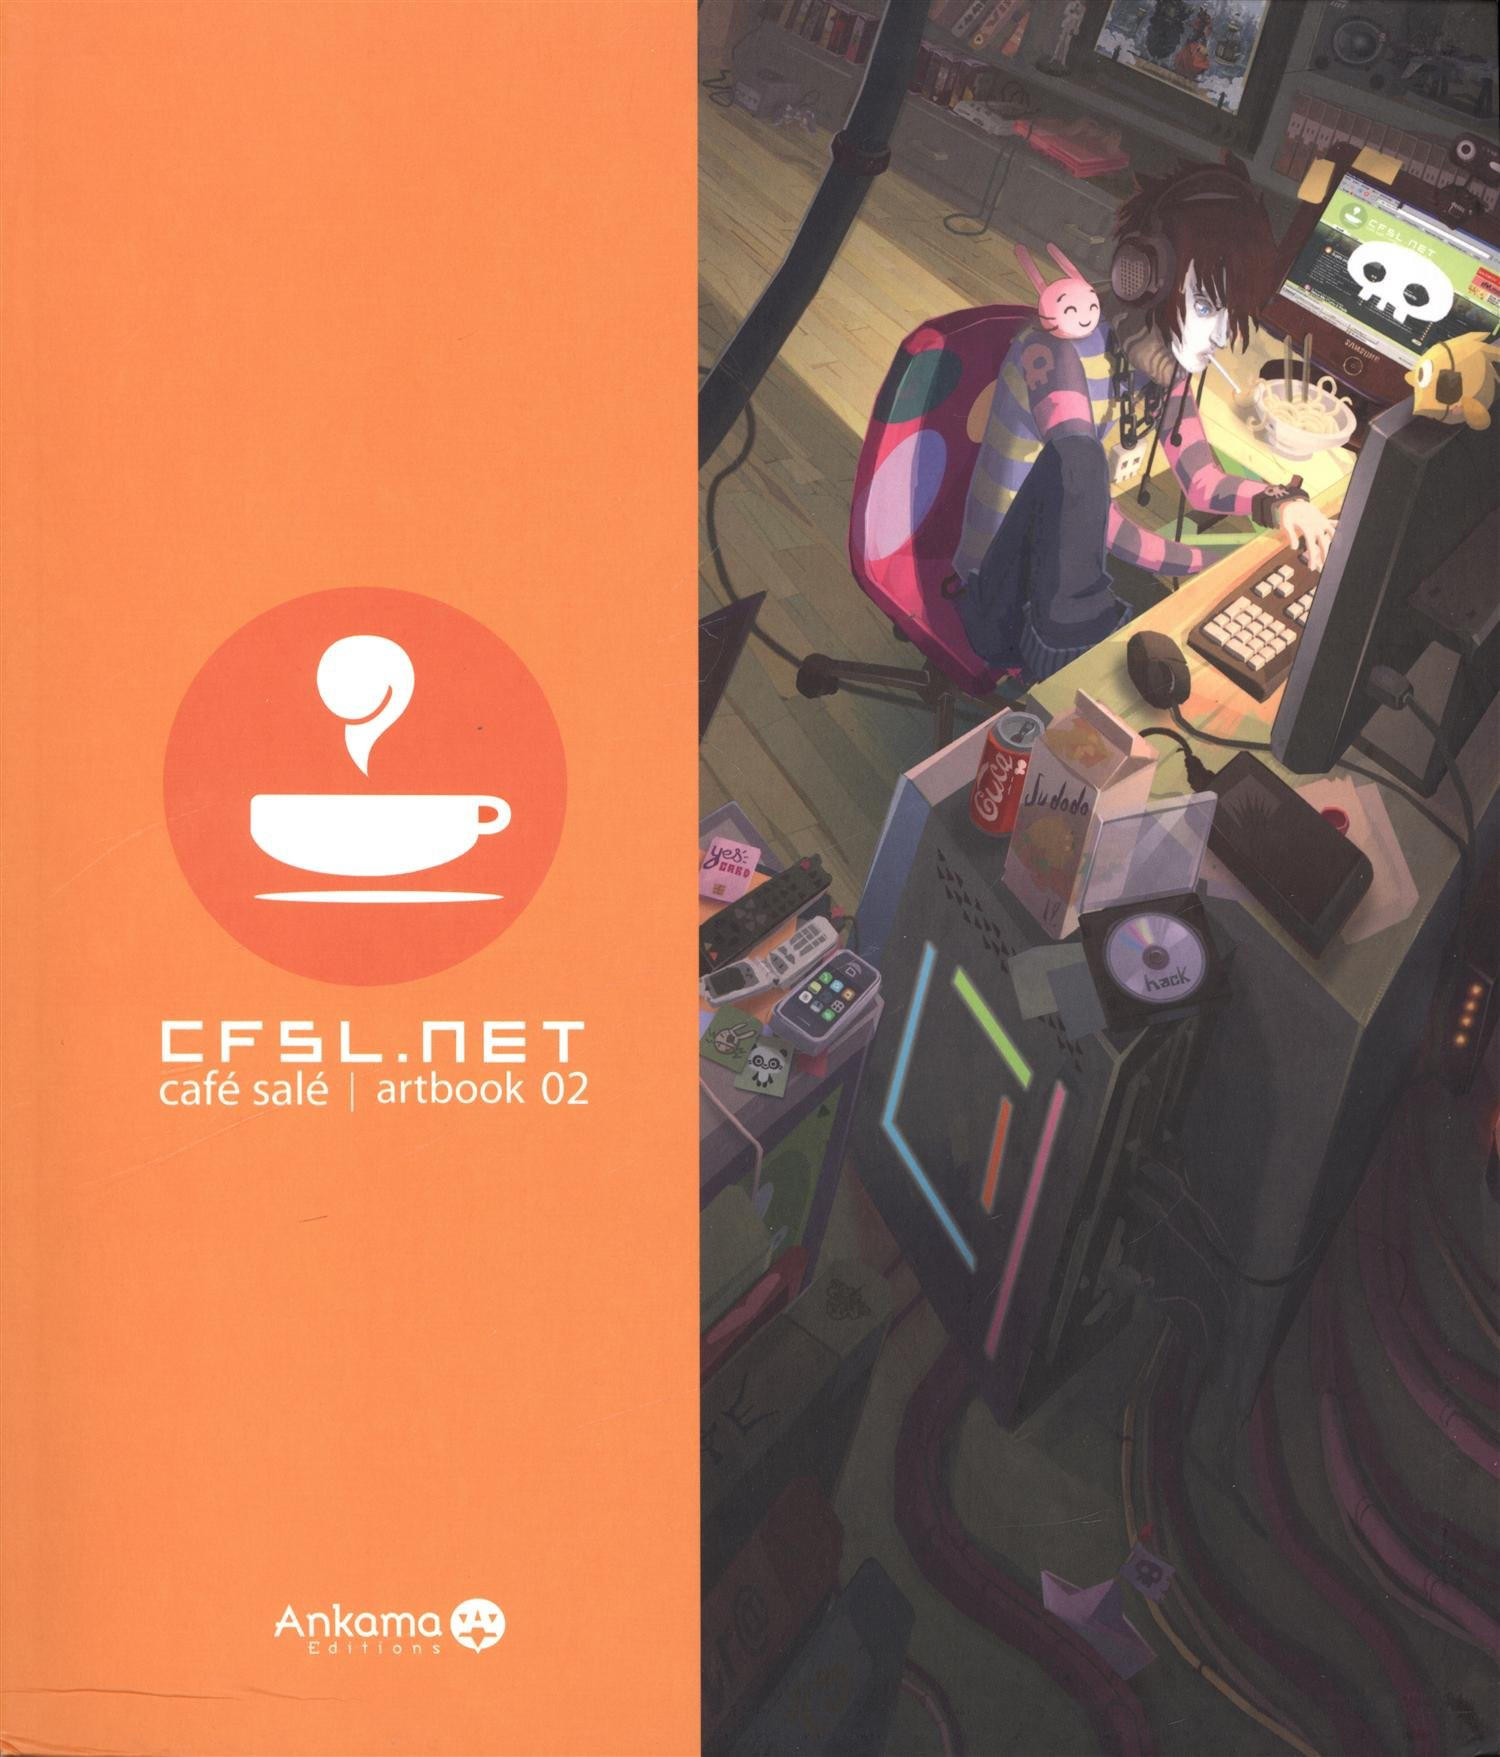 Artbook CFSL .Net Vol. 2 Broché – 3 juillet 2008 Ankama Editions 2916739416 VI-2916739416 Manga